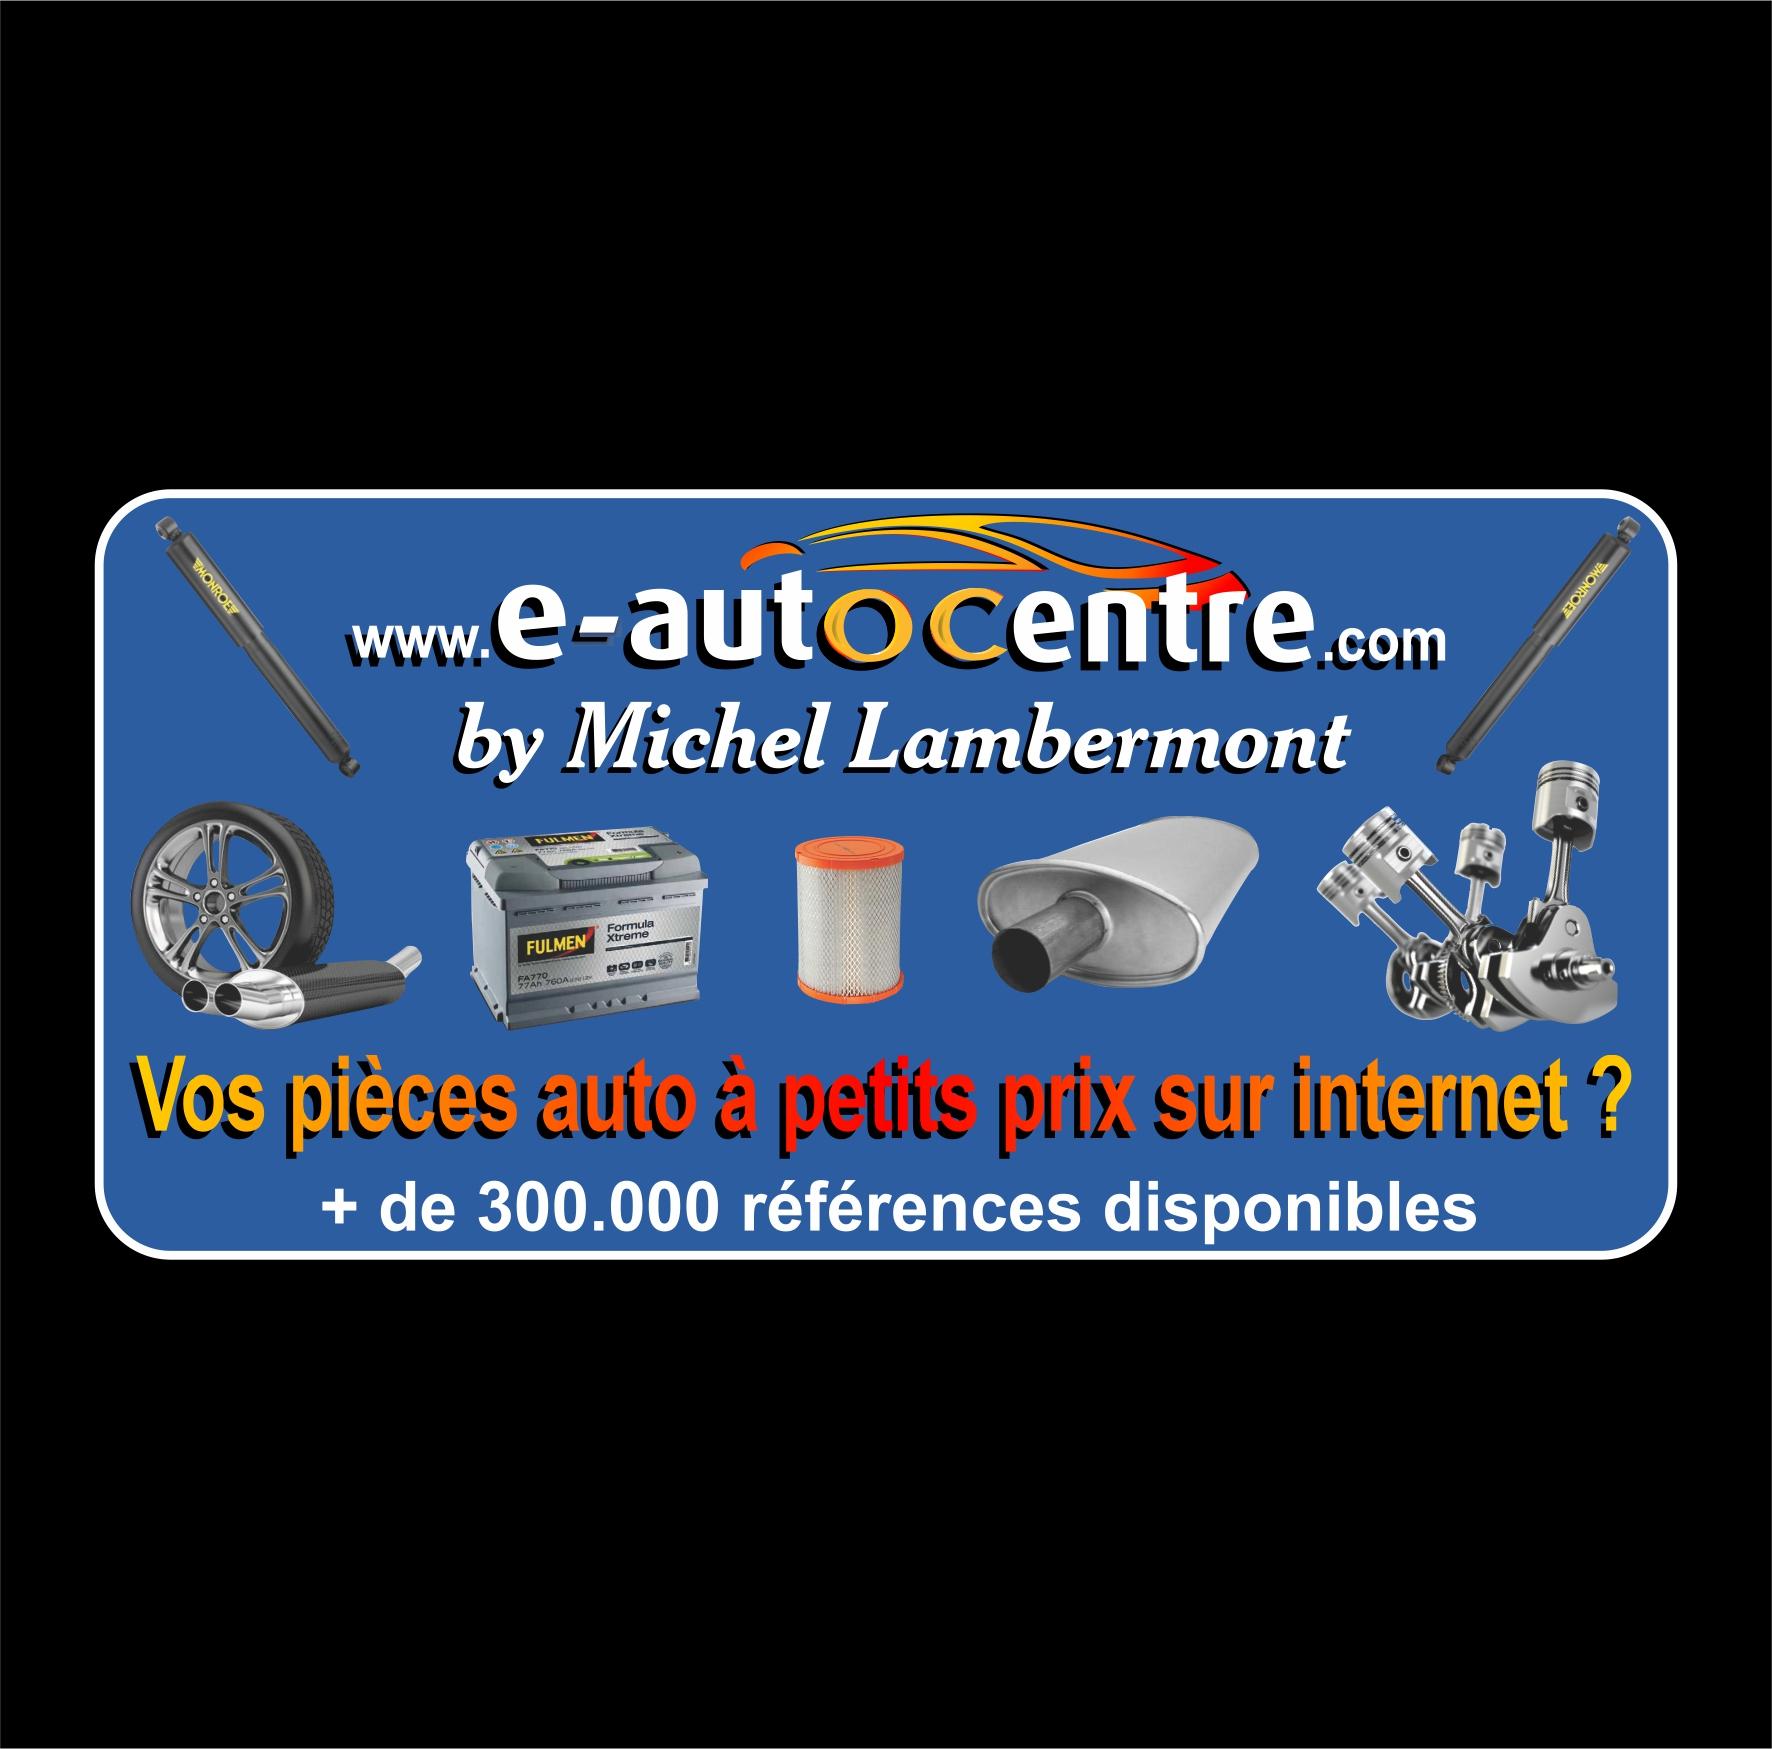 Auto-Center Lambermont